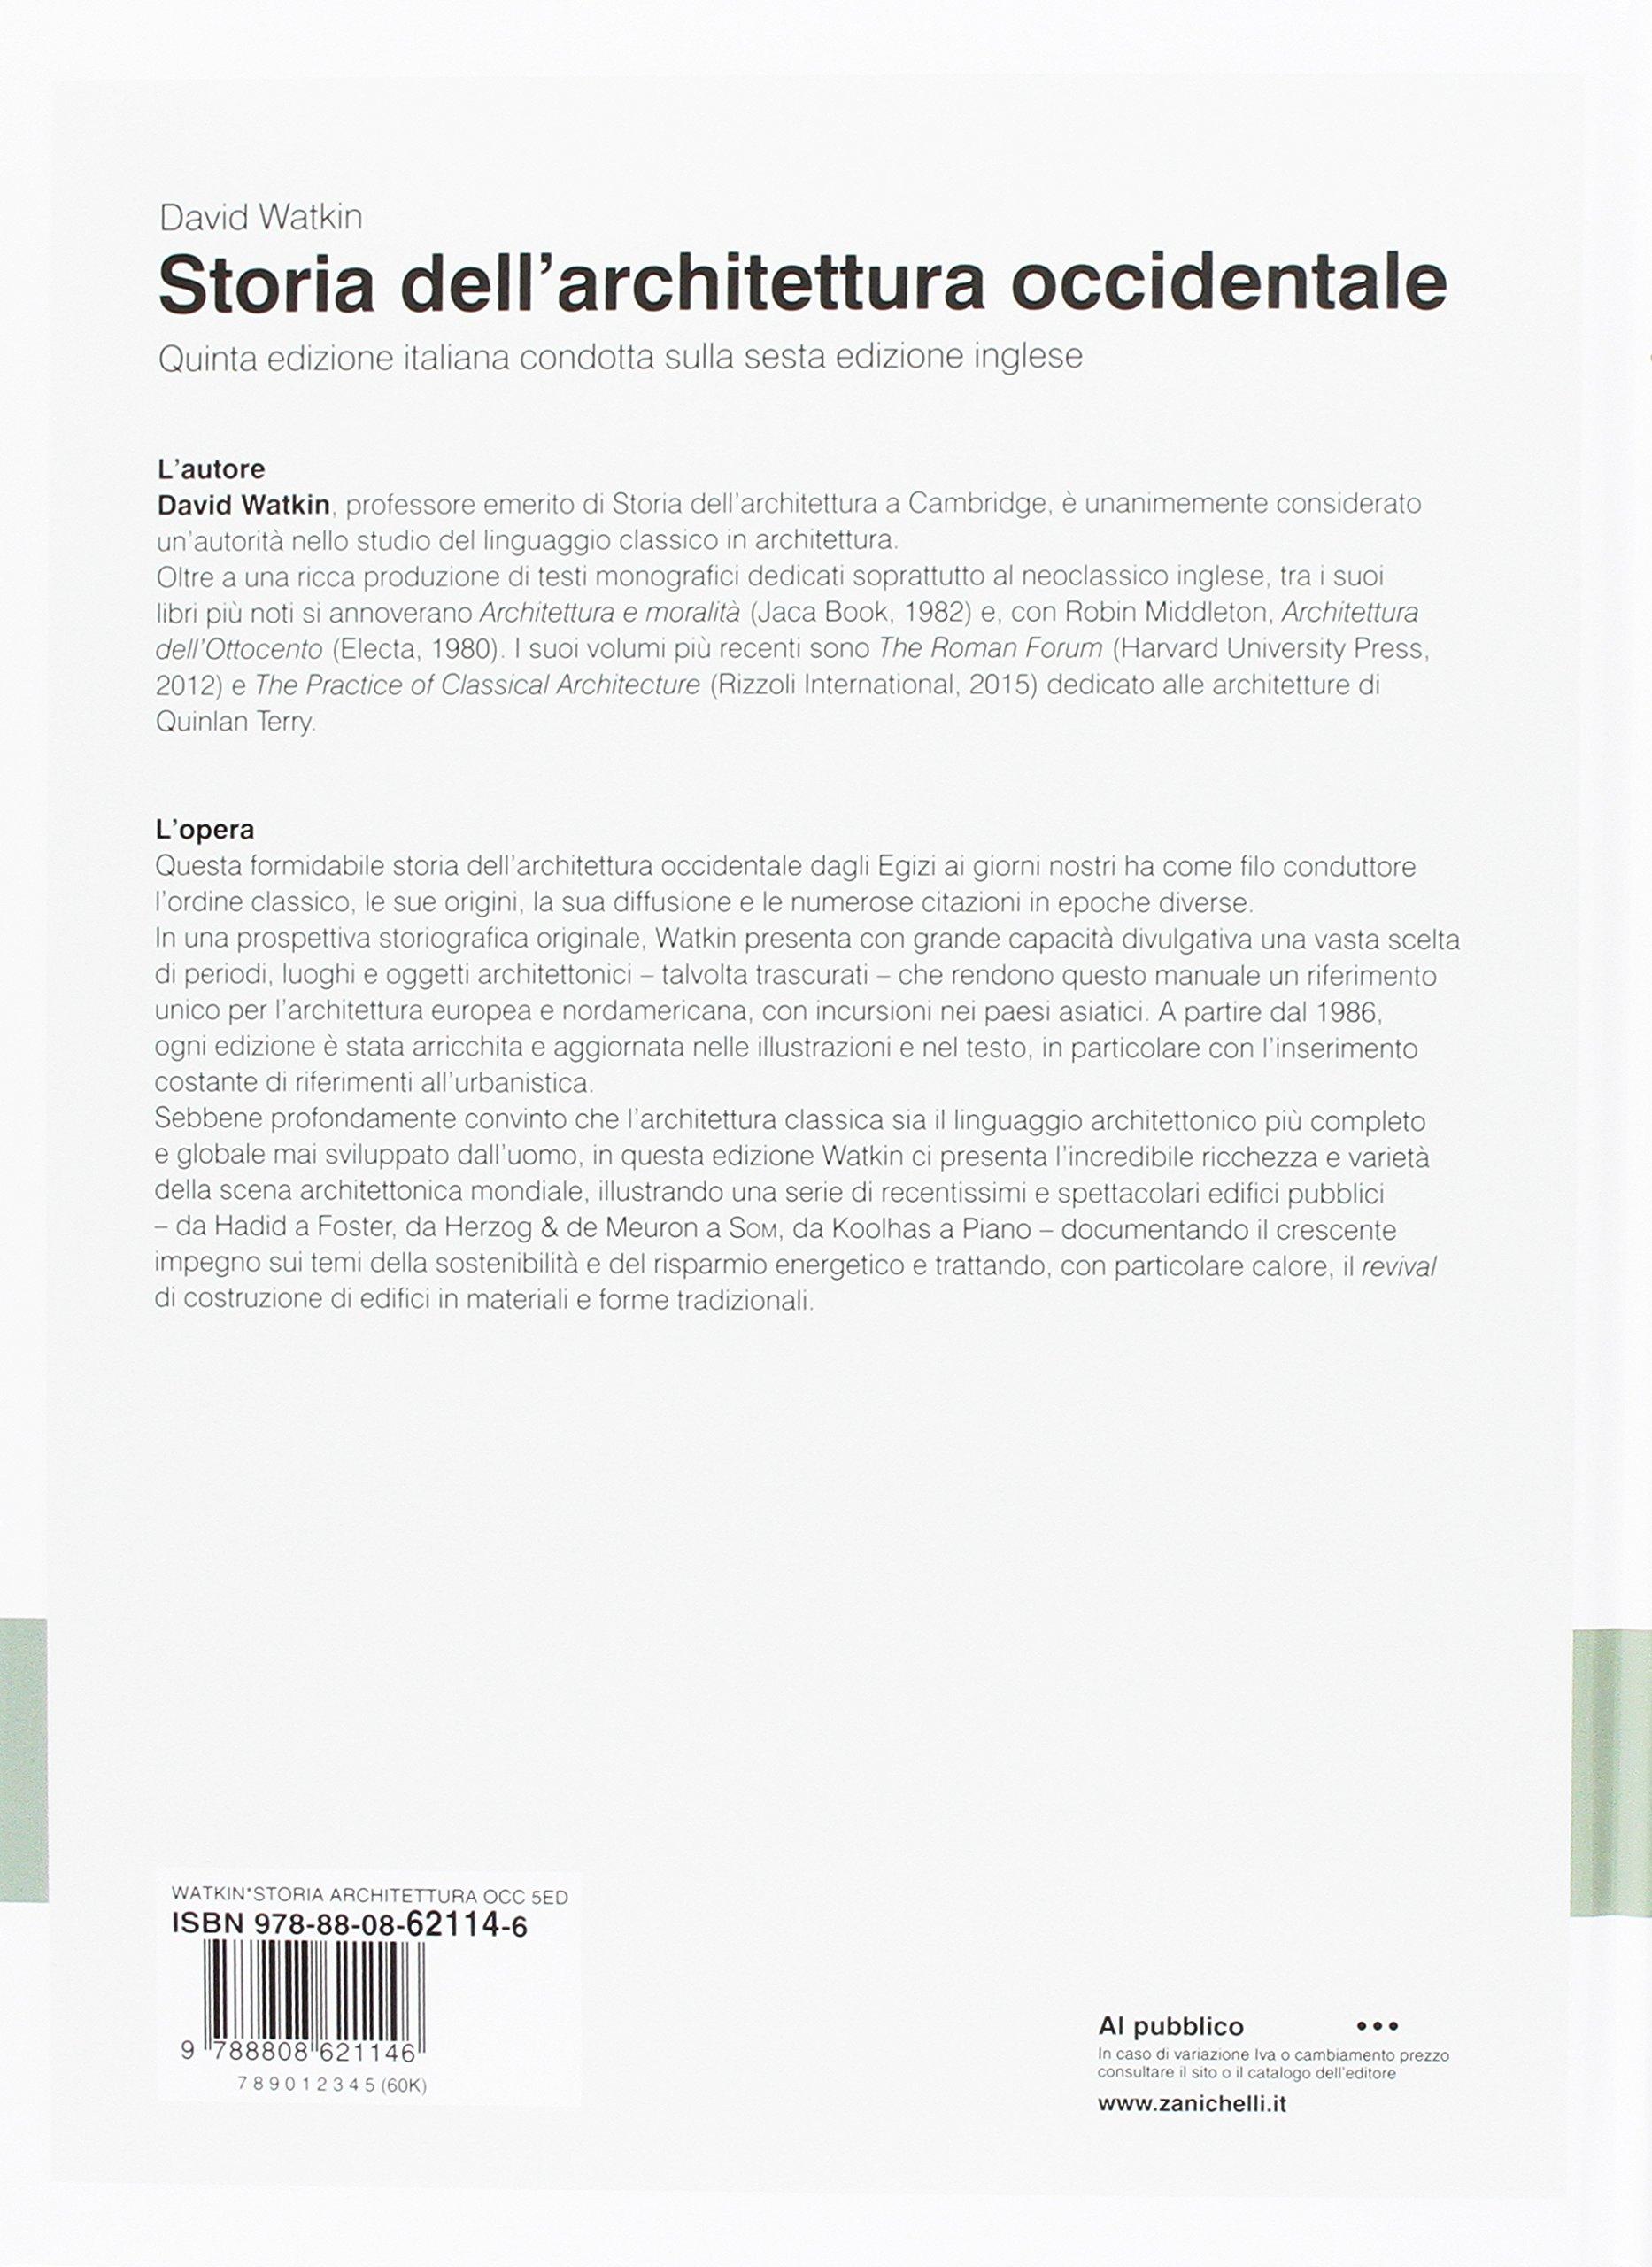 david watkin storia dell'architettura occidentale pdf download